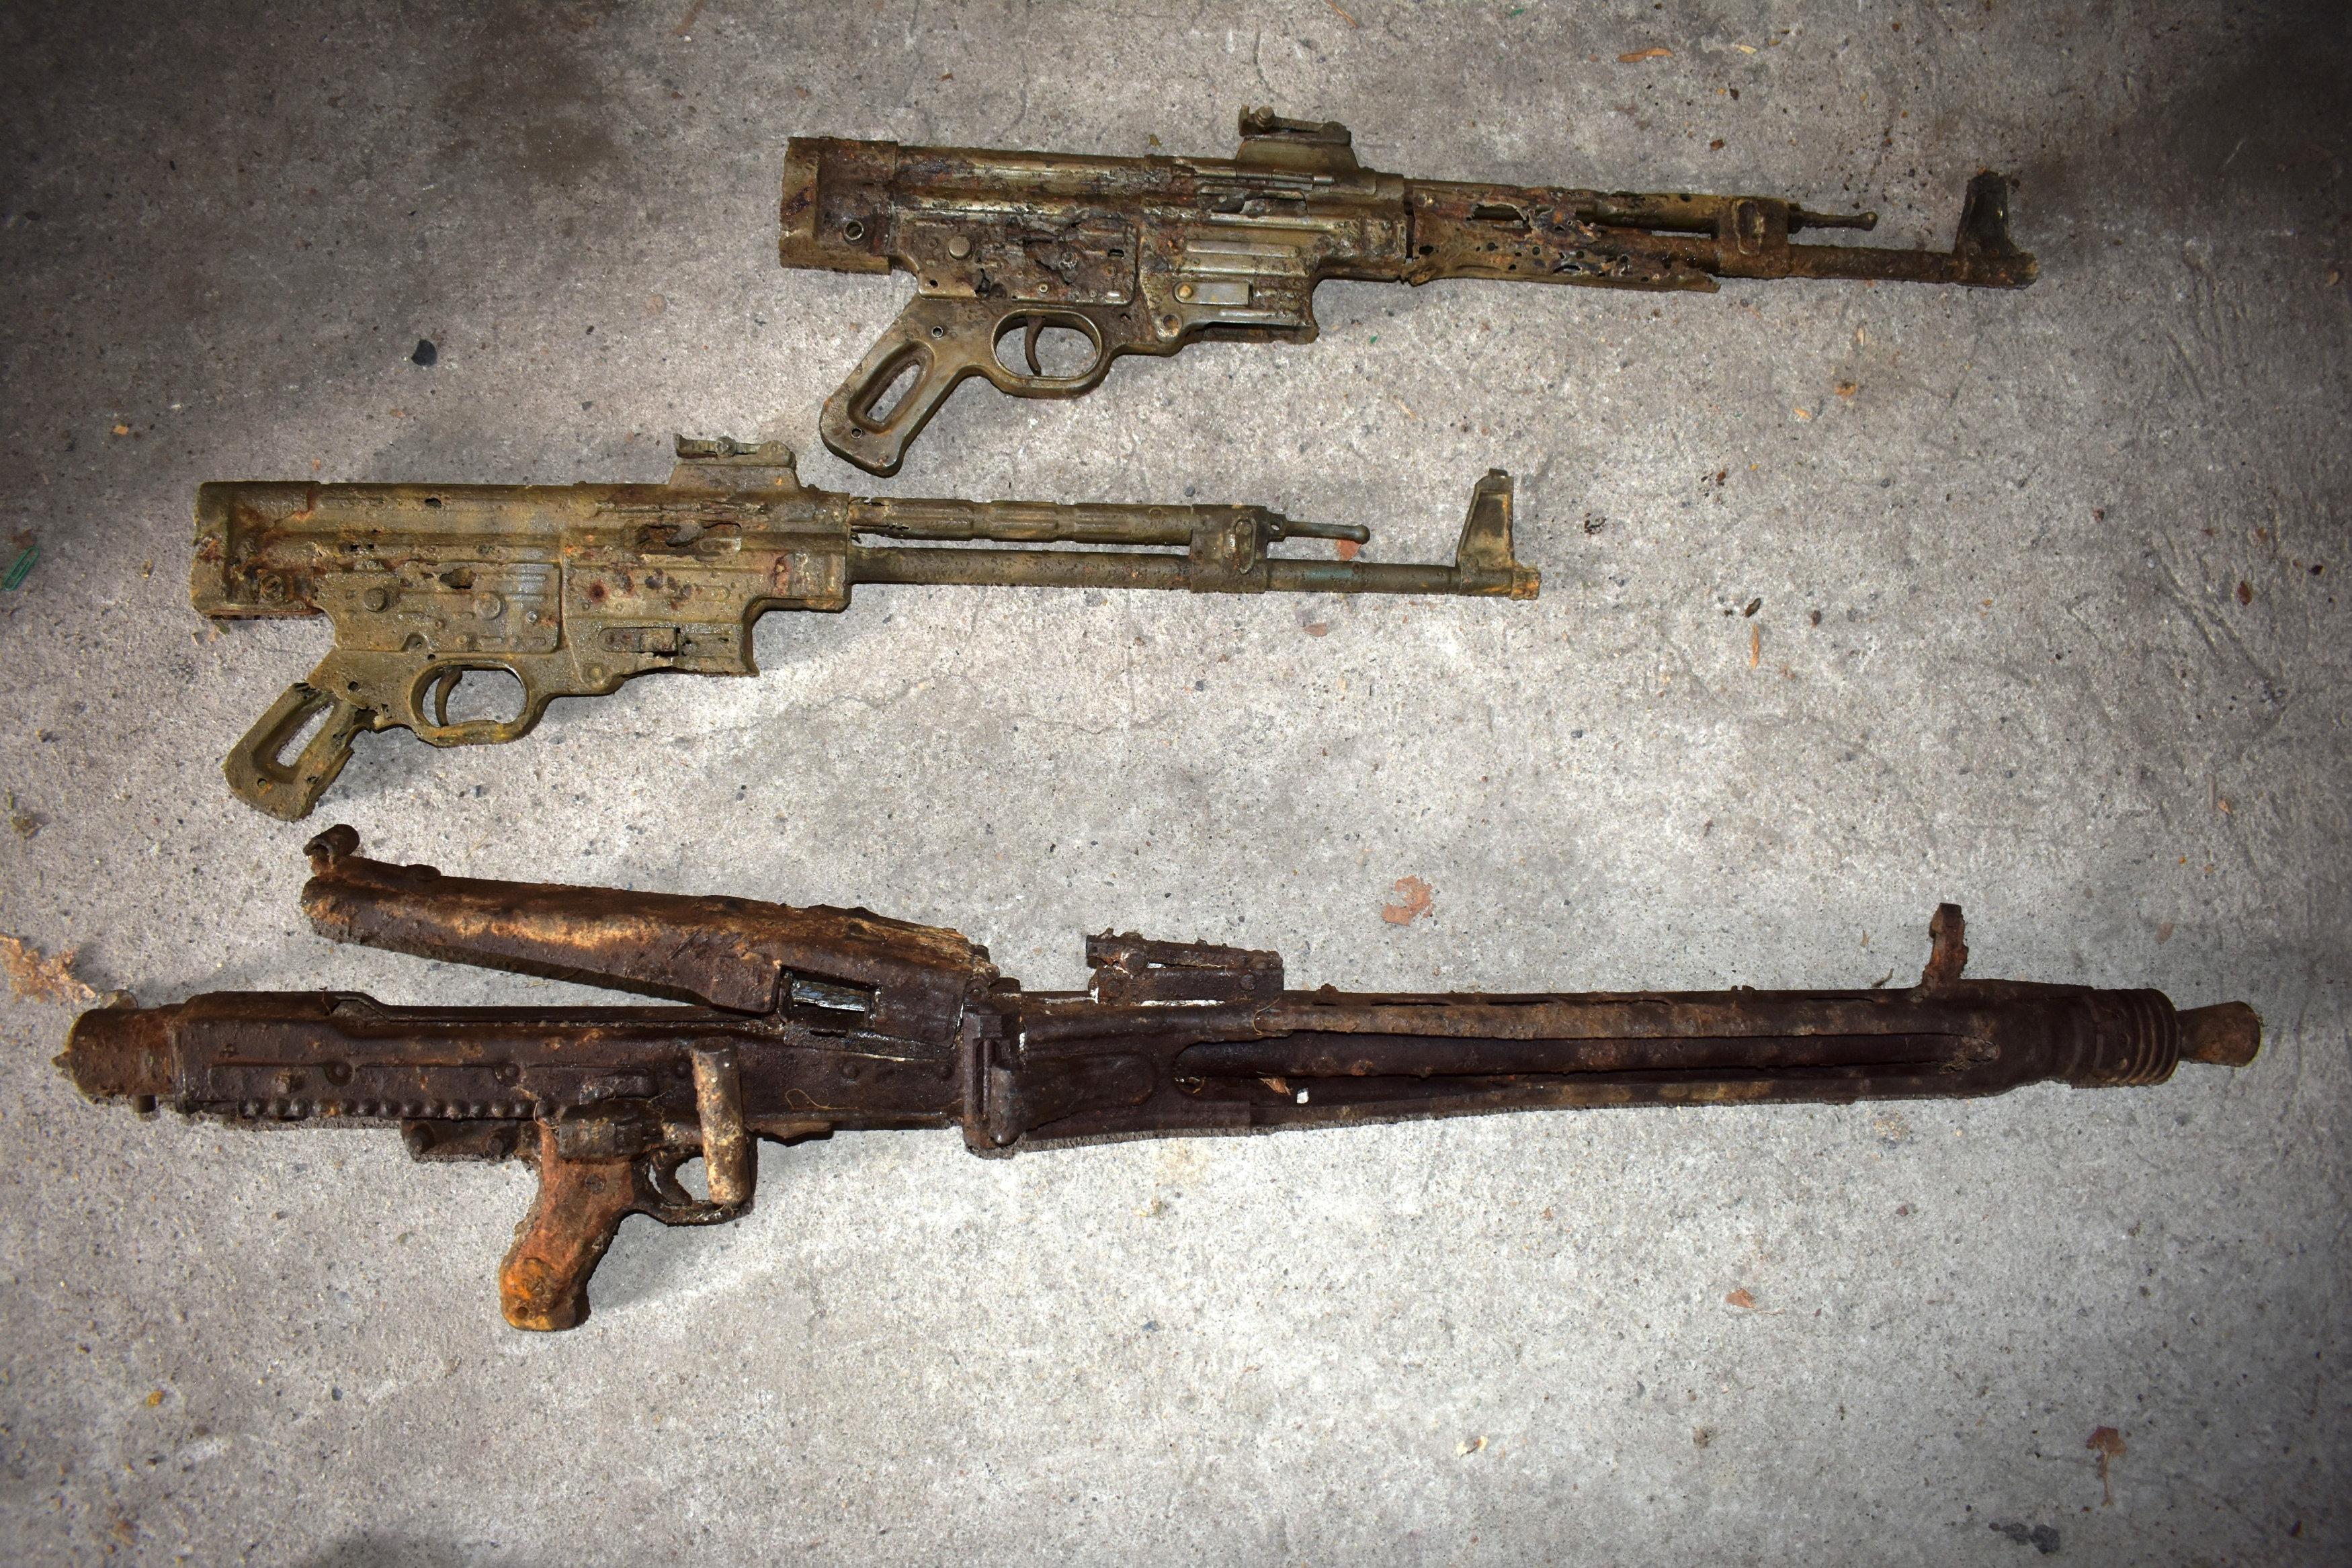 German police seize Nazi-era weapons man said to have found